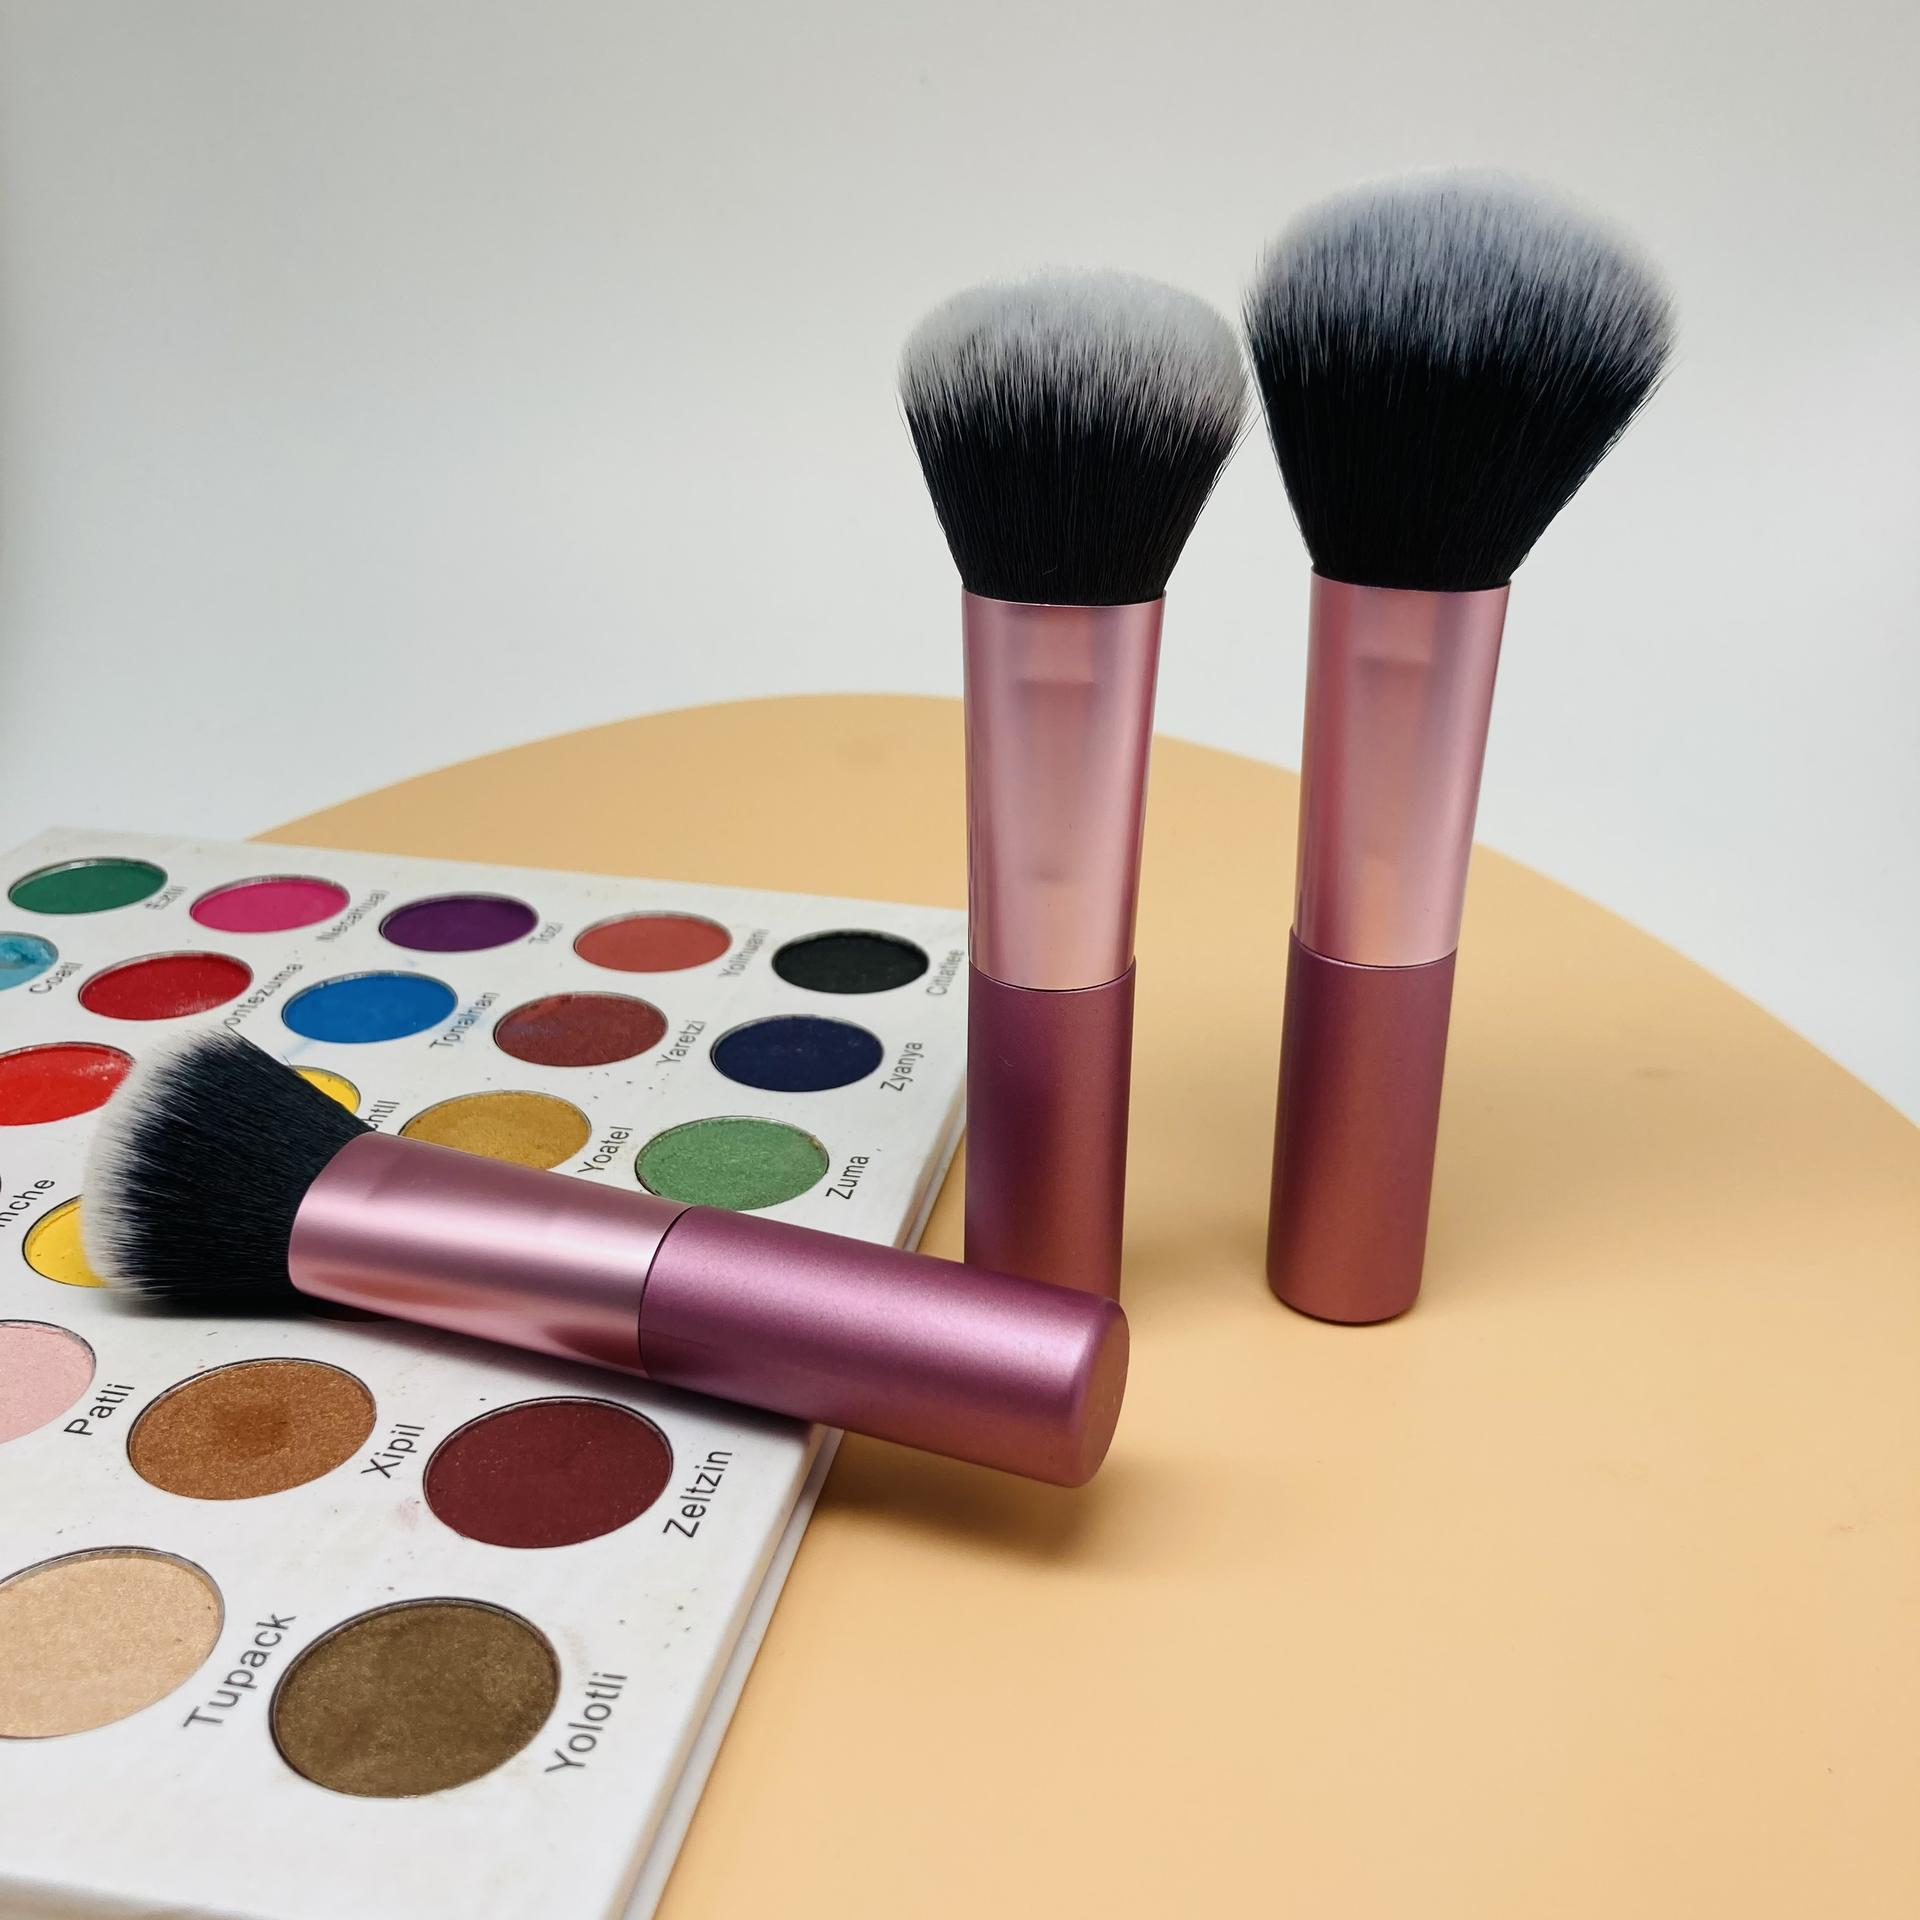 Brush cosmetics high quality make up brushes professional powder cosmetic brush with logo